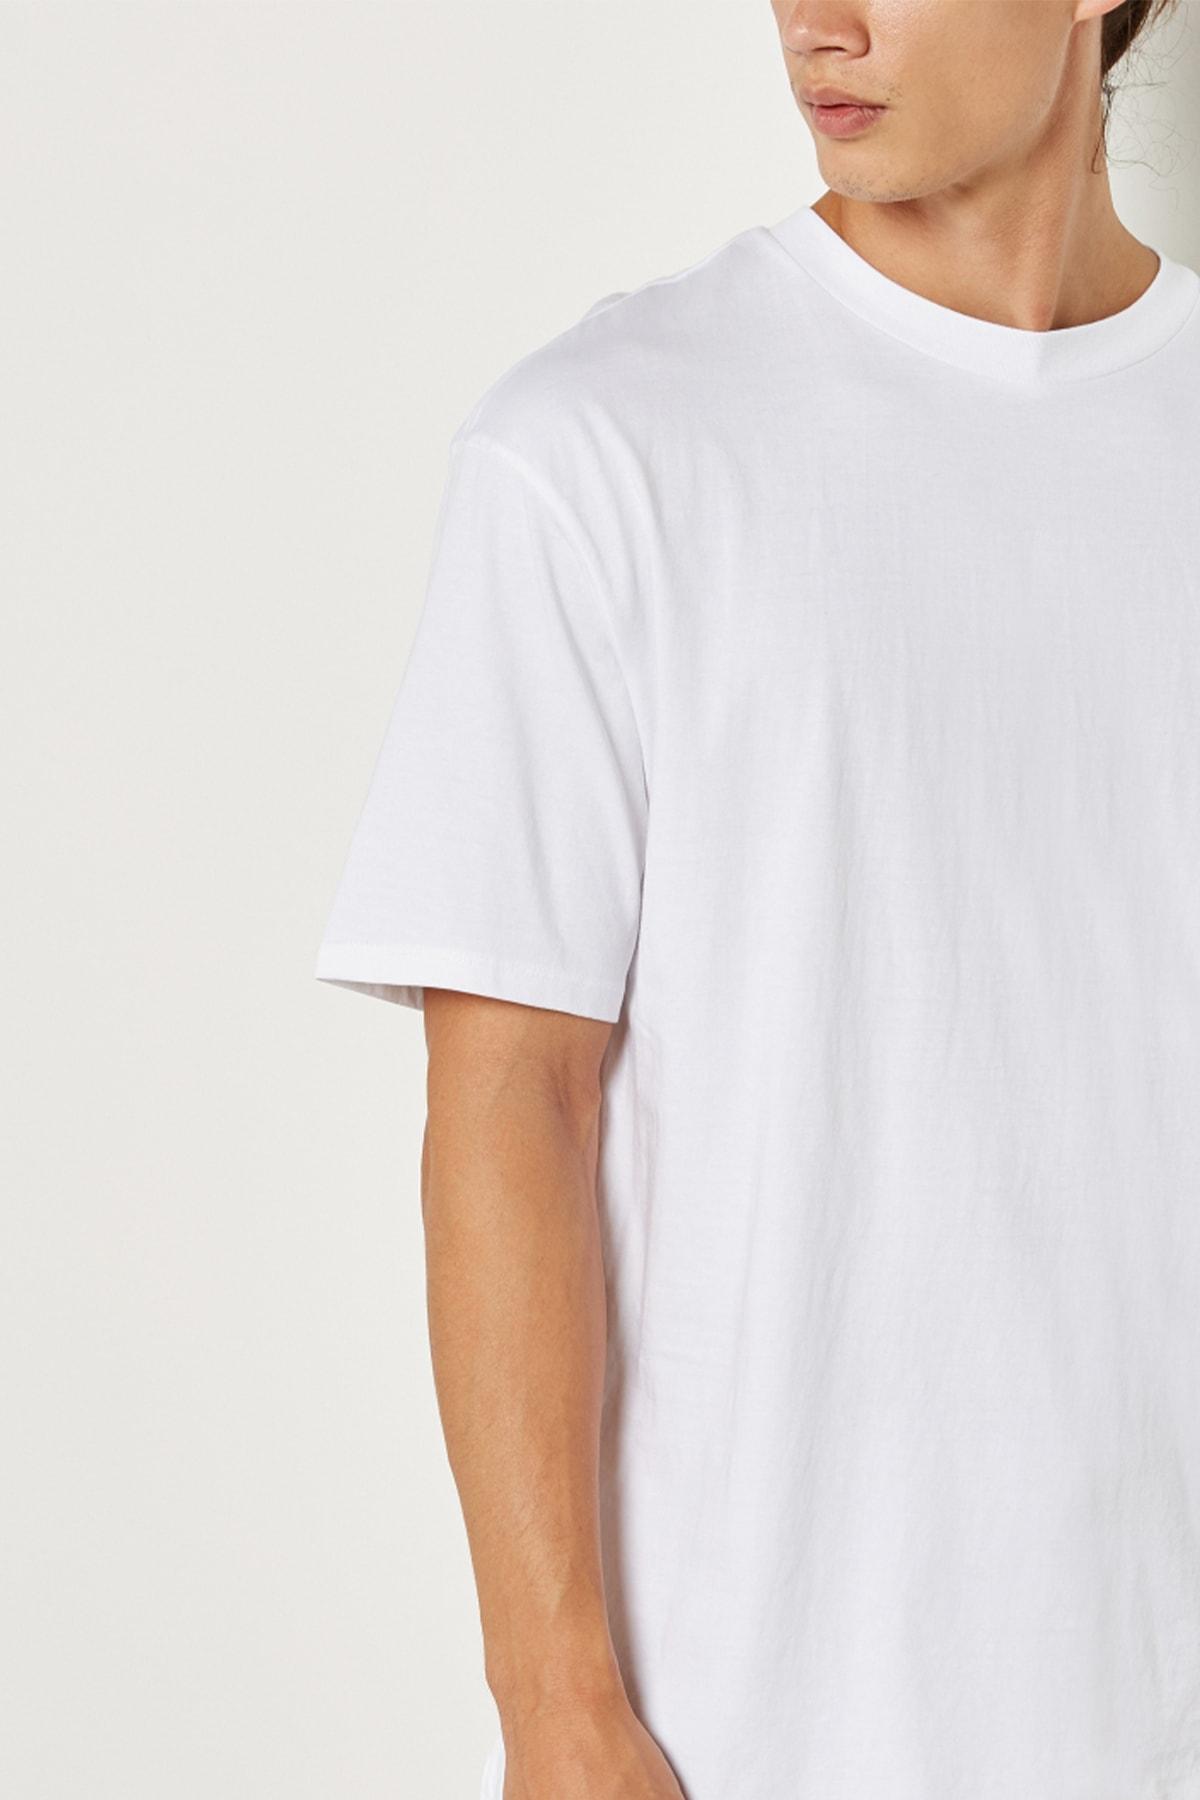 Relax&Basic Erkek Beyaz Oversize Basic T-shirt 2